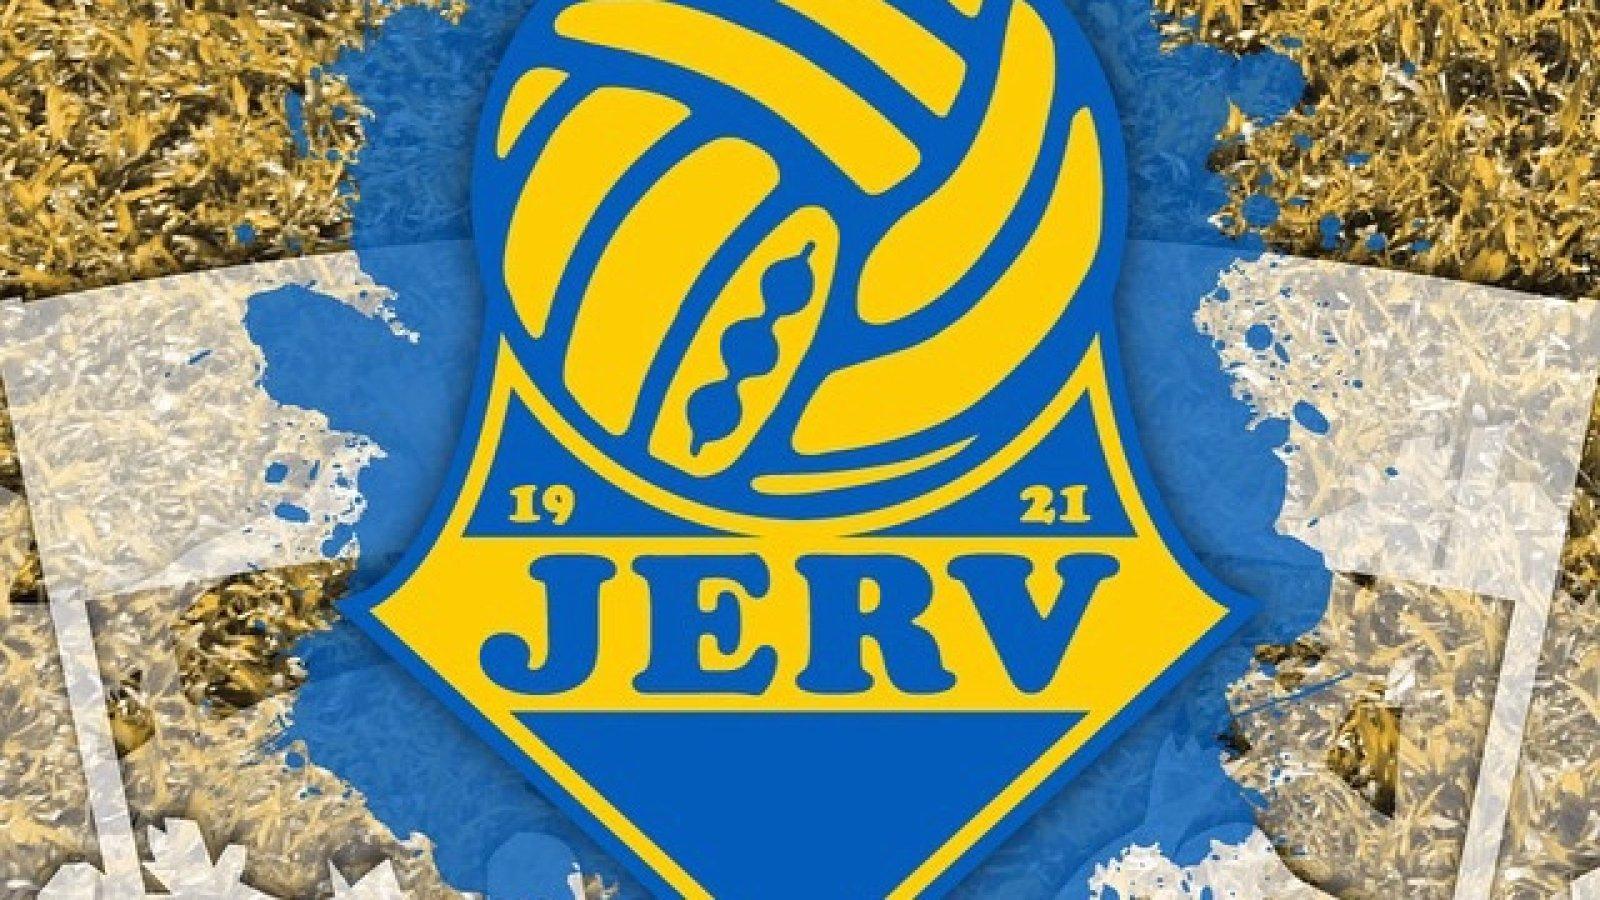 JERV_LOGO